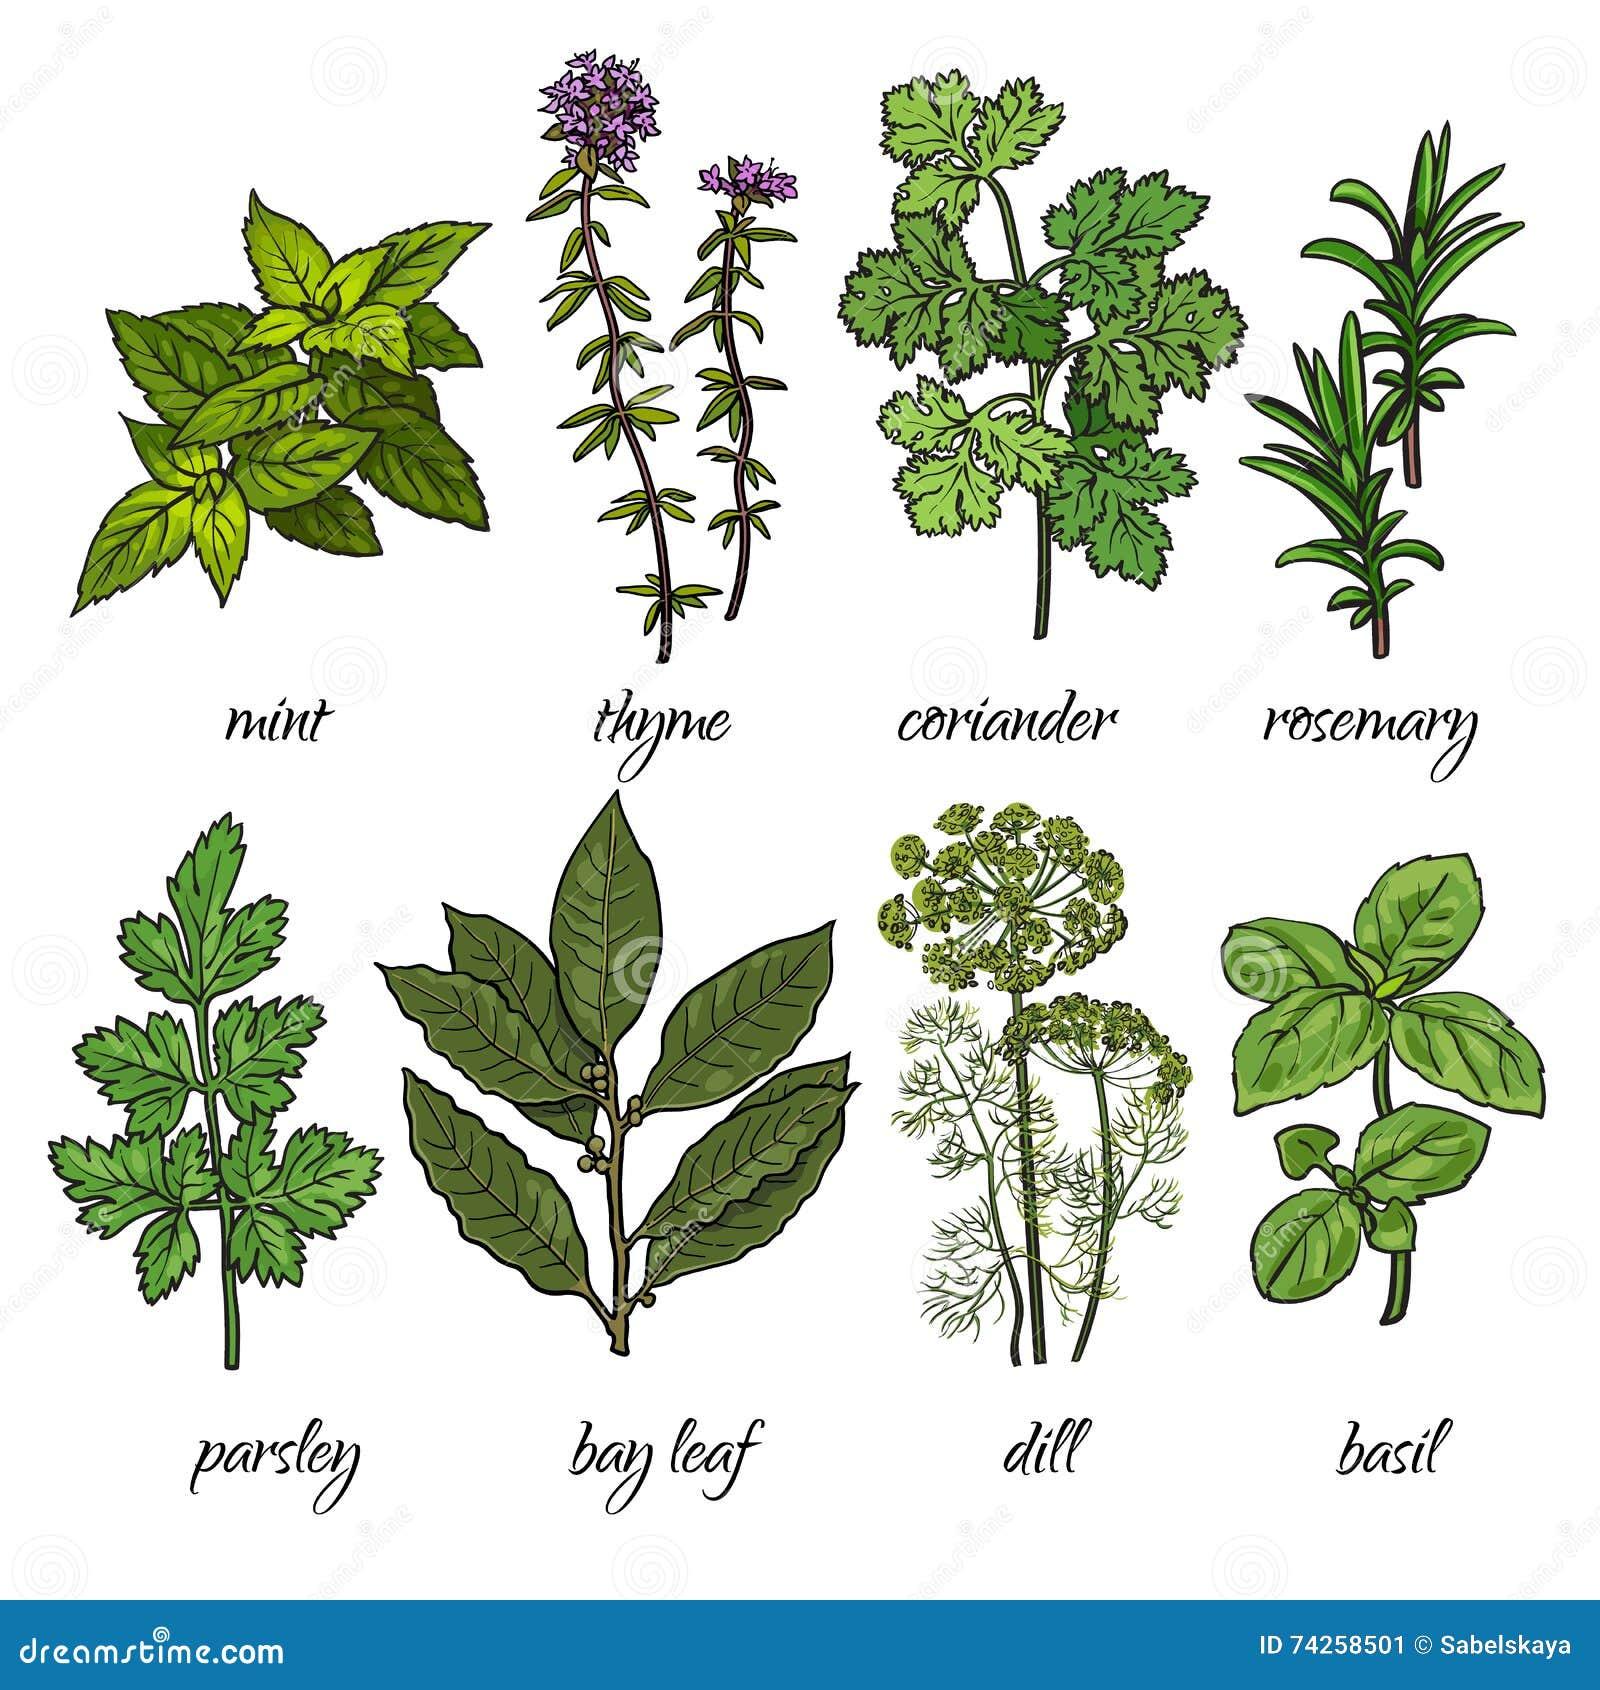 ensemble de romarin menthe thym coriandre persil basilic herbes d 39 aneth illustration de. Black Bedroom Furniture Sets. Home Design Ideas